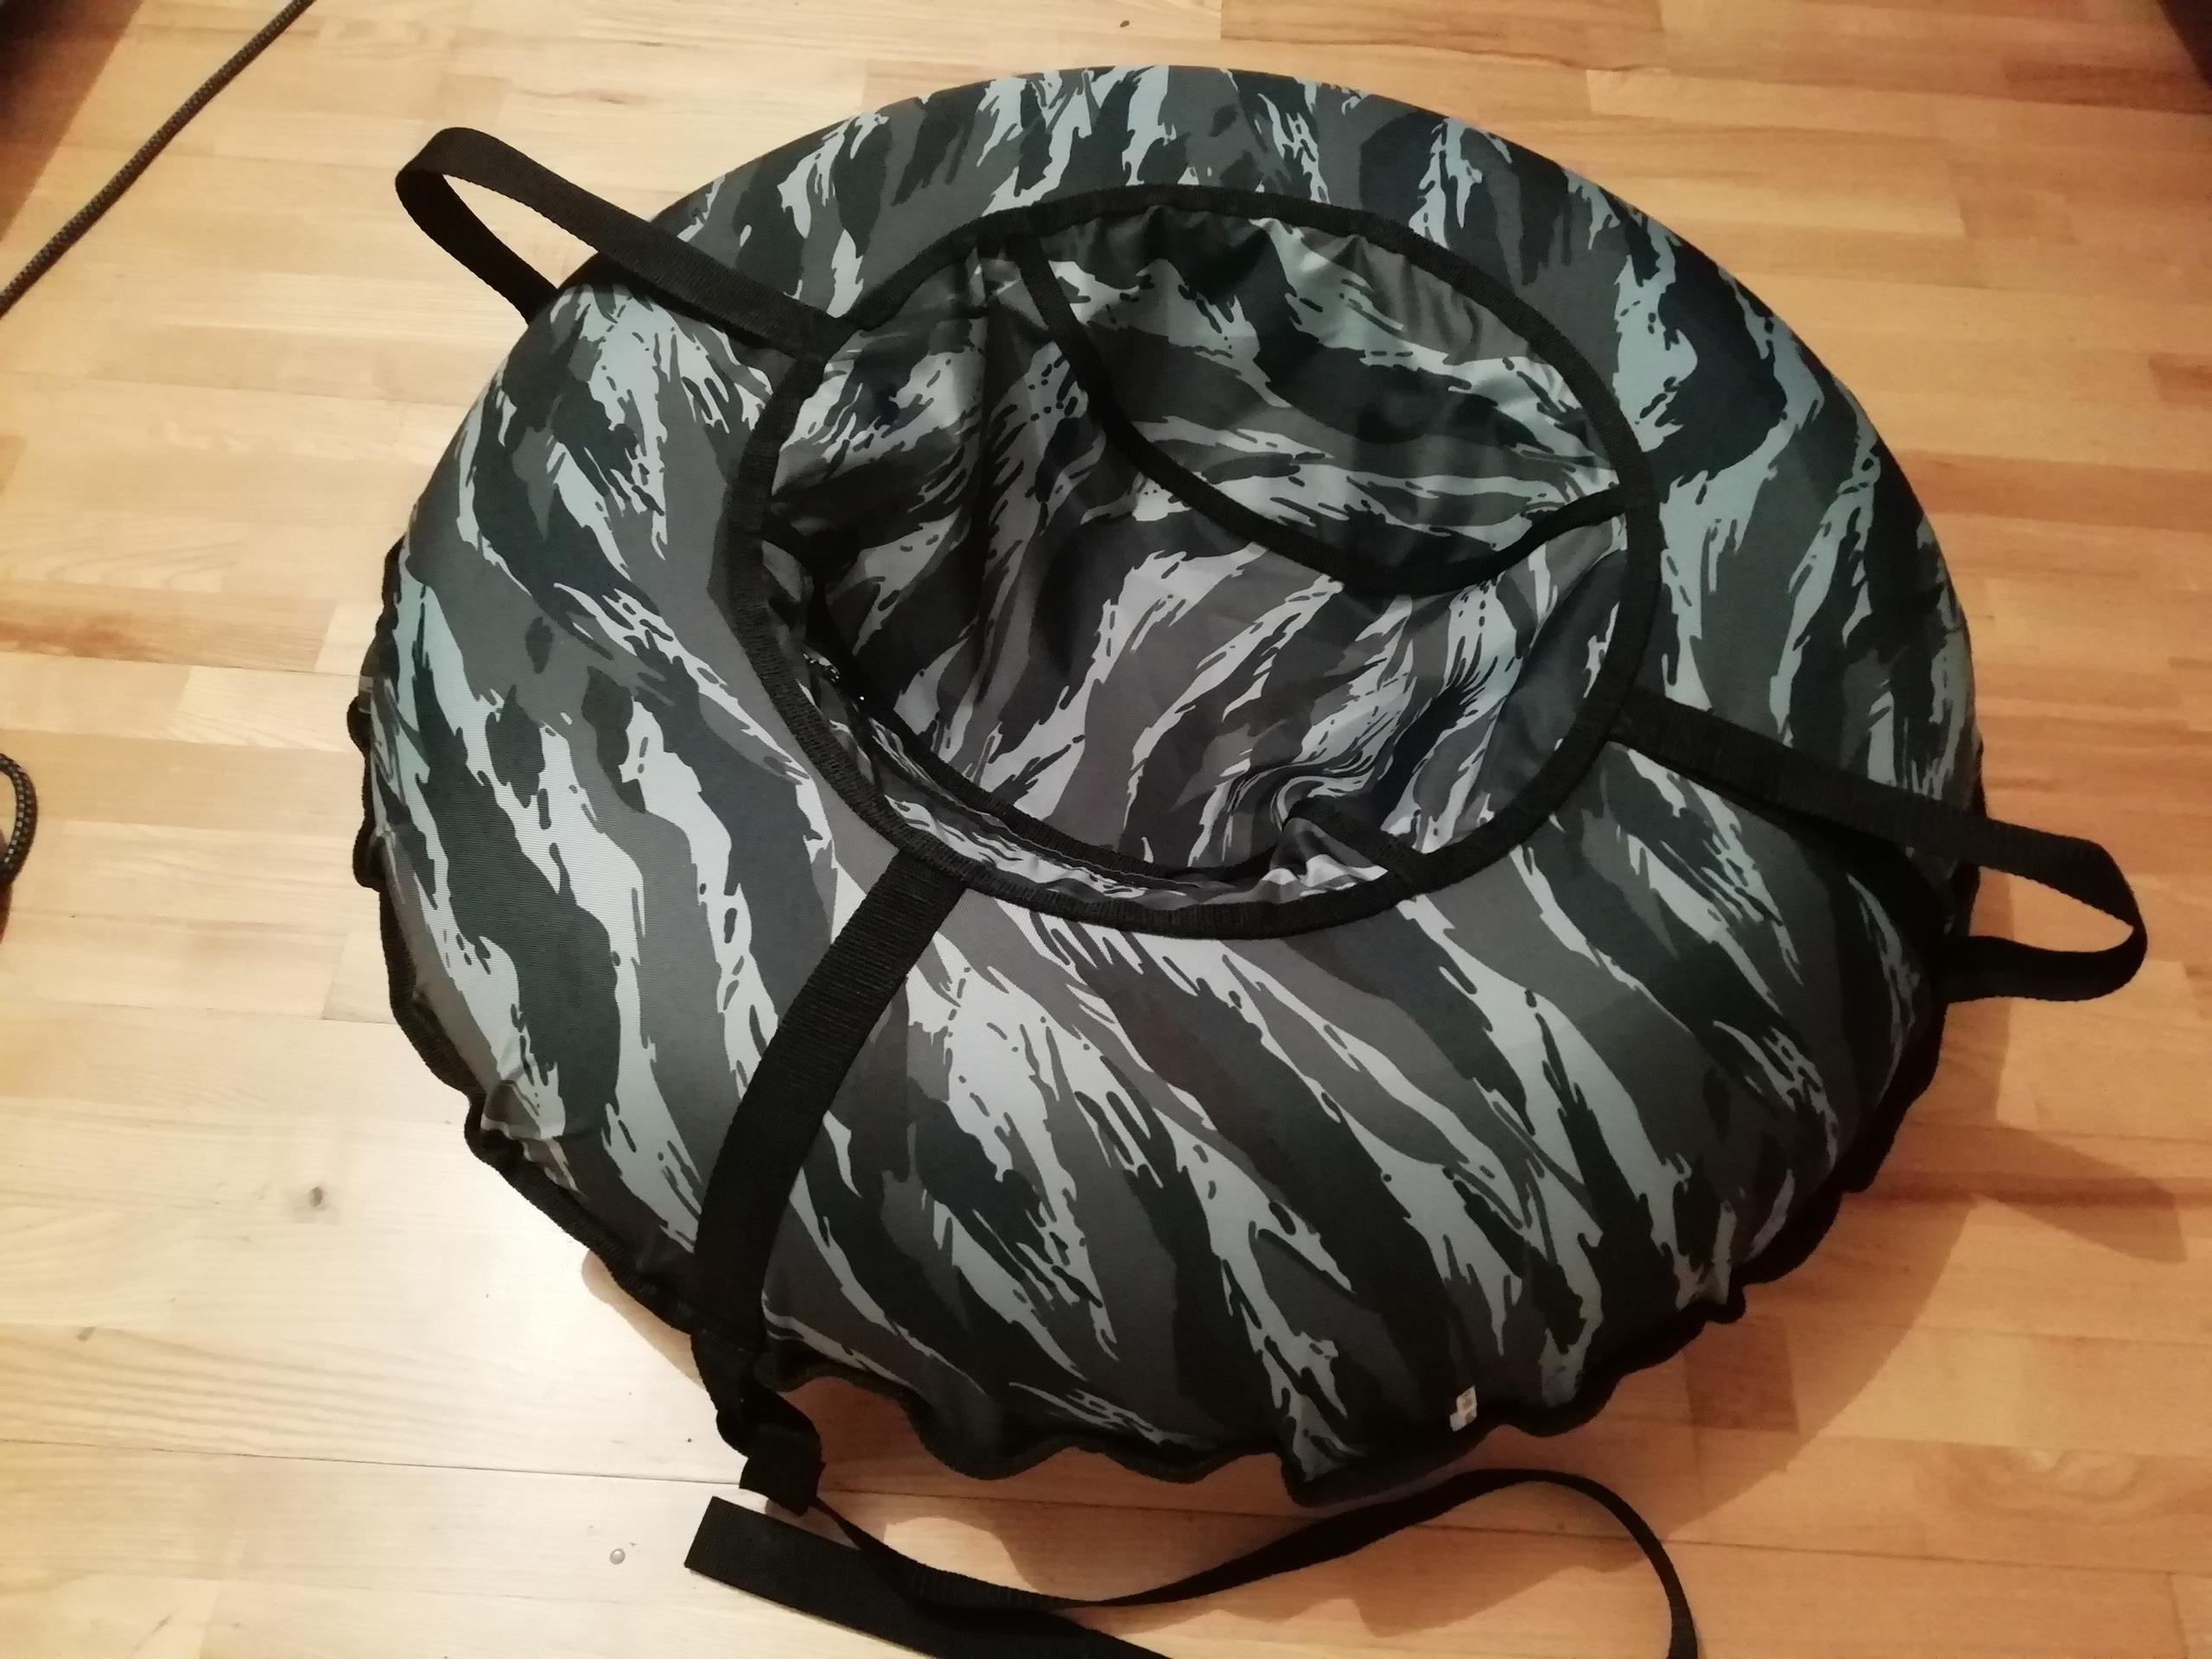 купить санки ватрушку тюбинг сноутьюб подушку плюшку для катания самара